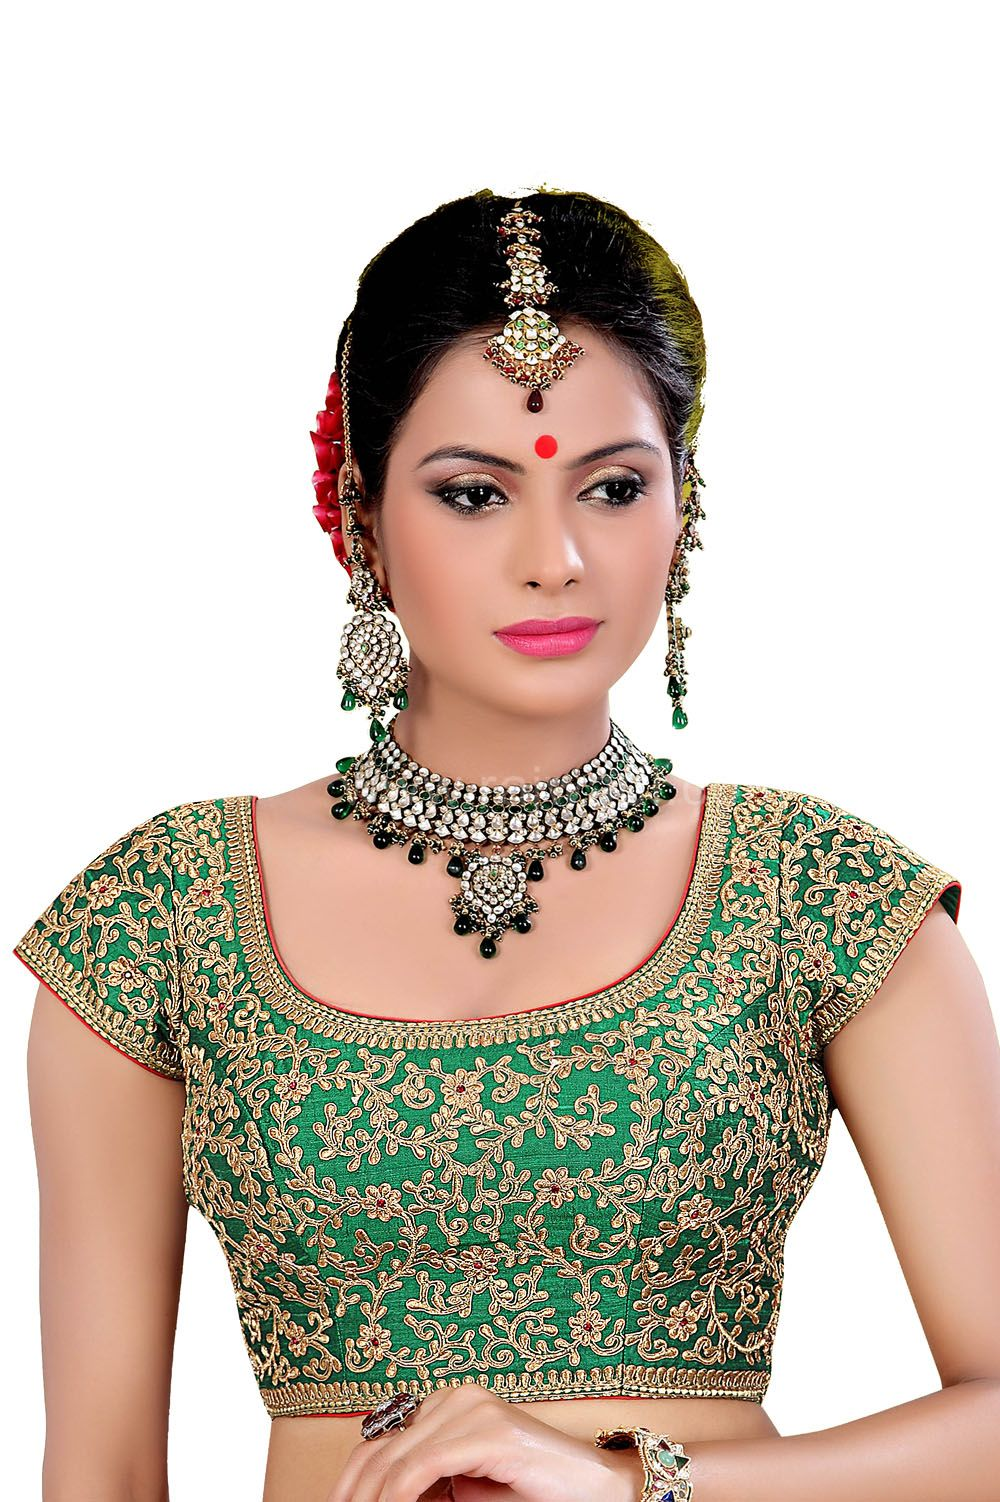 fcbba39e523f8b Wonderful Green Coloured Ready Choli | Piękne sari i biżuteria ...